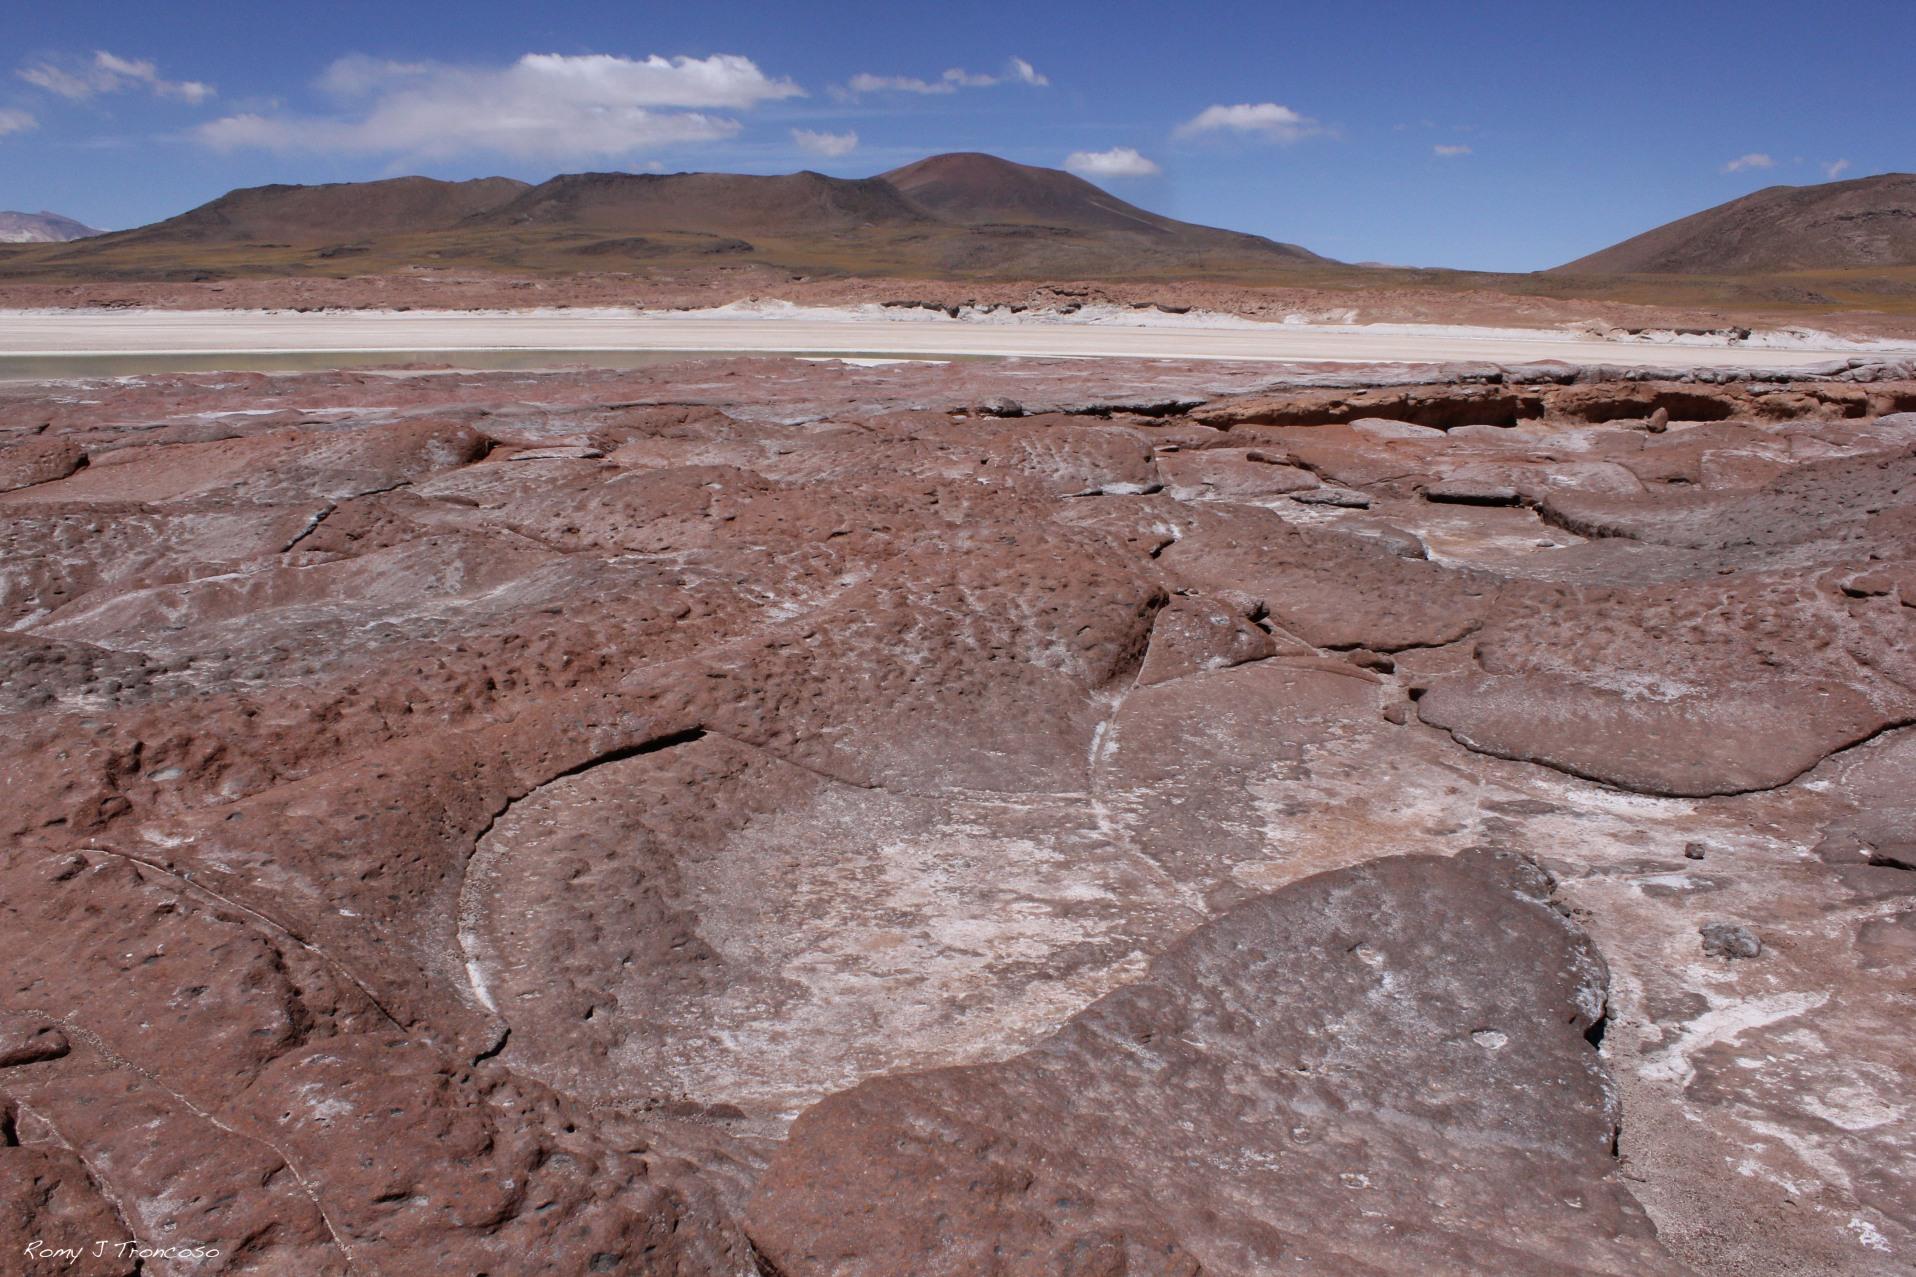 Piedras Rojas. Salar Aguas Calientes. 4500 metros. Foto por Romy J. Troncoso.